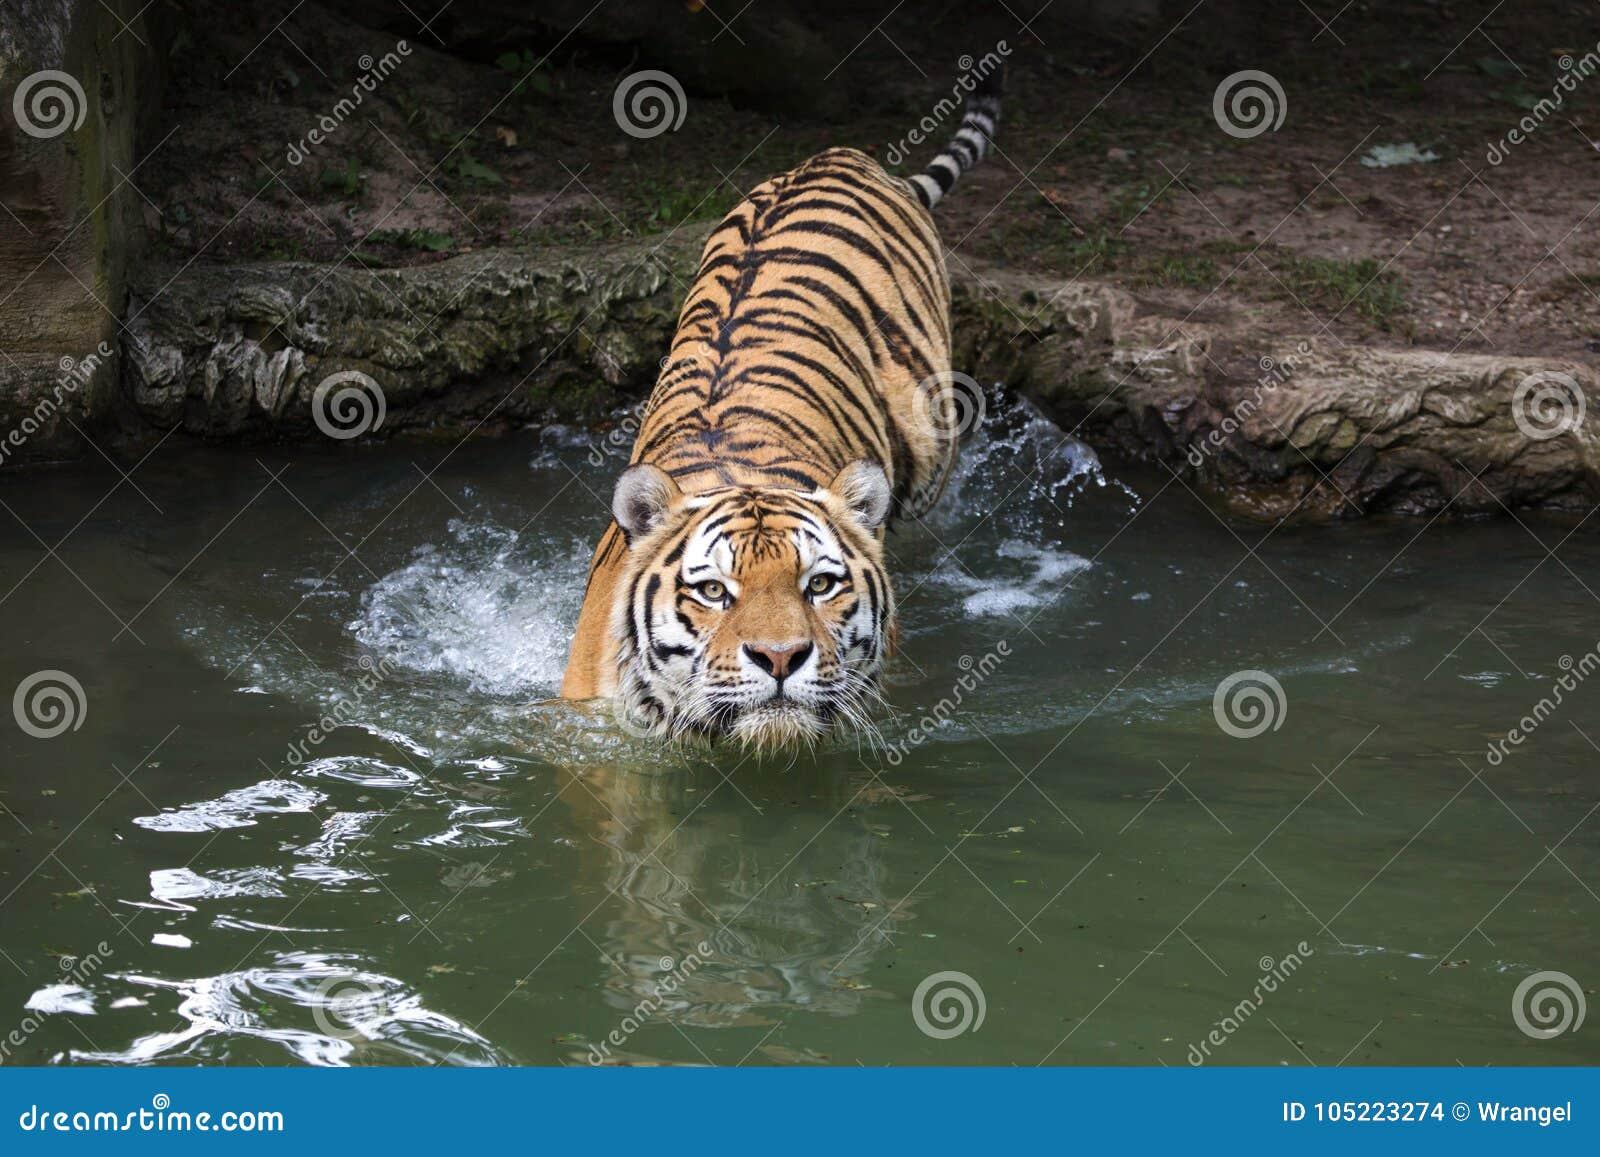 Pantheratigris för Siberian tiger altaica